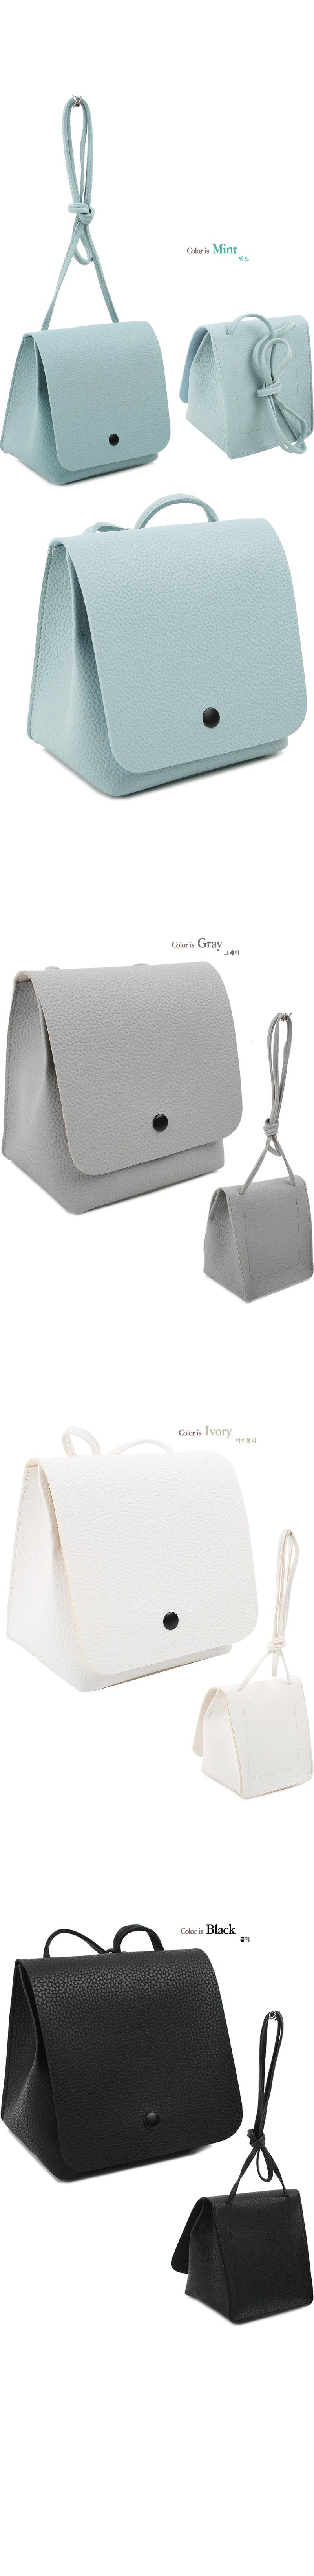 minibag no.K20800view-2